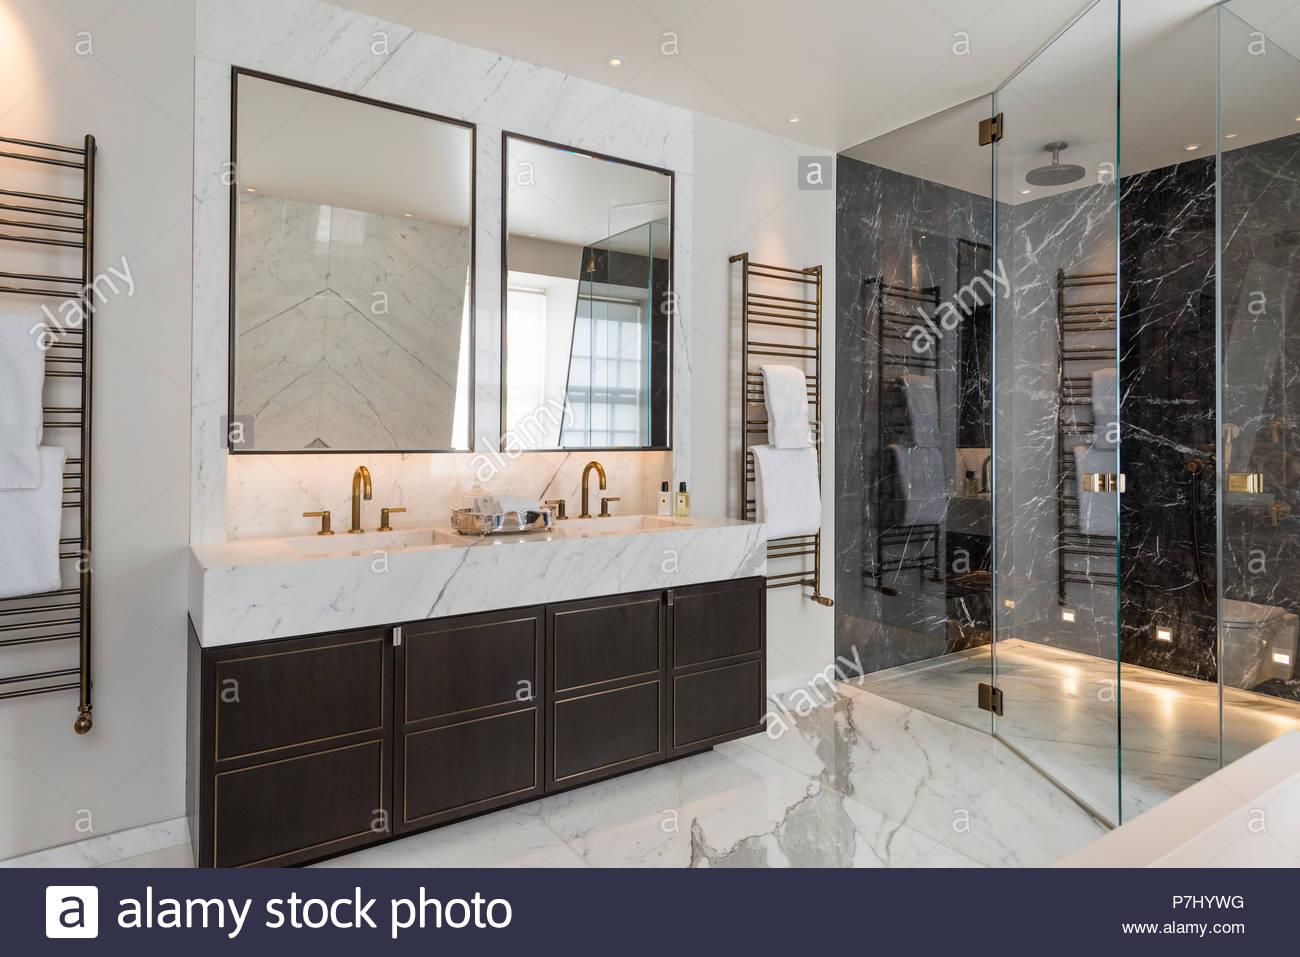 Shower And Washbasin In Art Deco Bathroom Stock Photo 211222076 Alamy